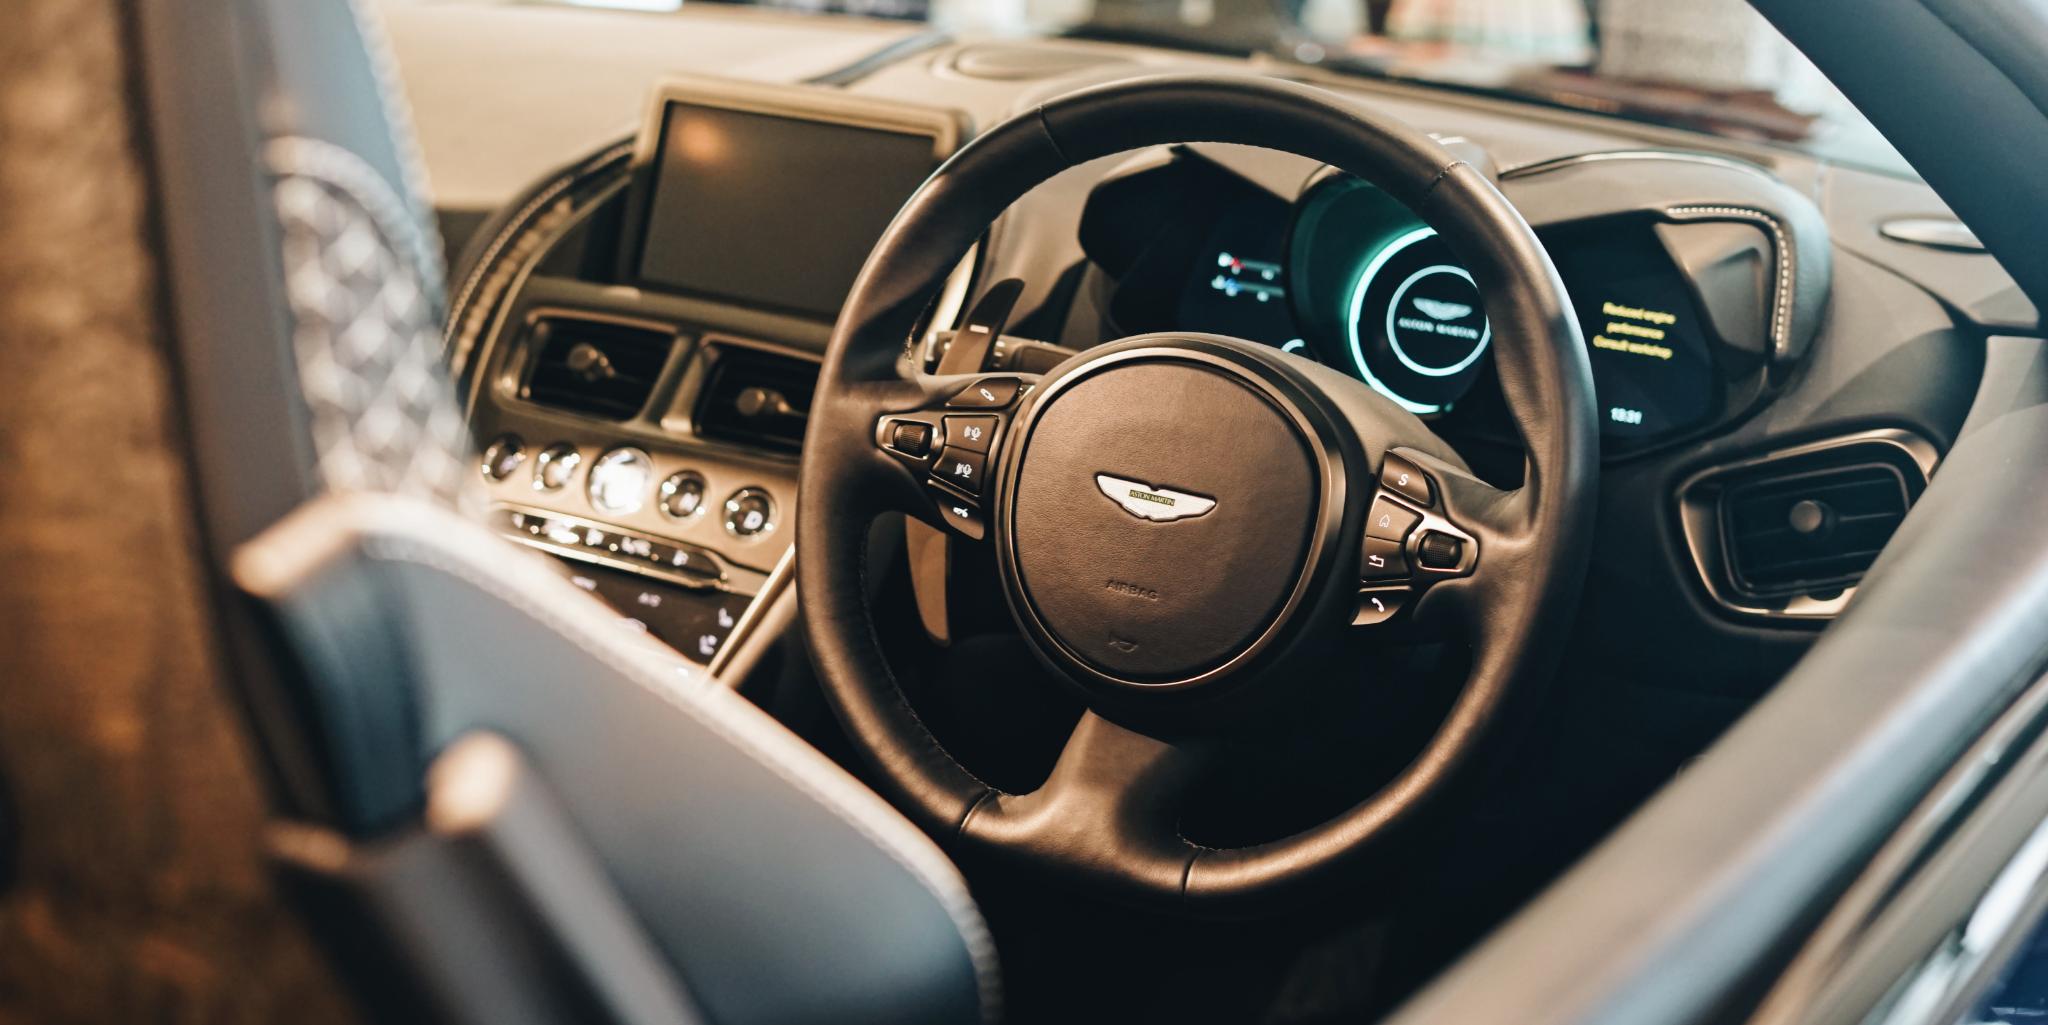 Aston Martin DBS Superleggera Volante Leather Steering Wheel